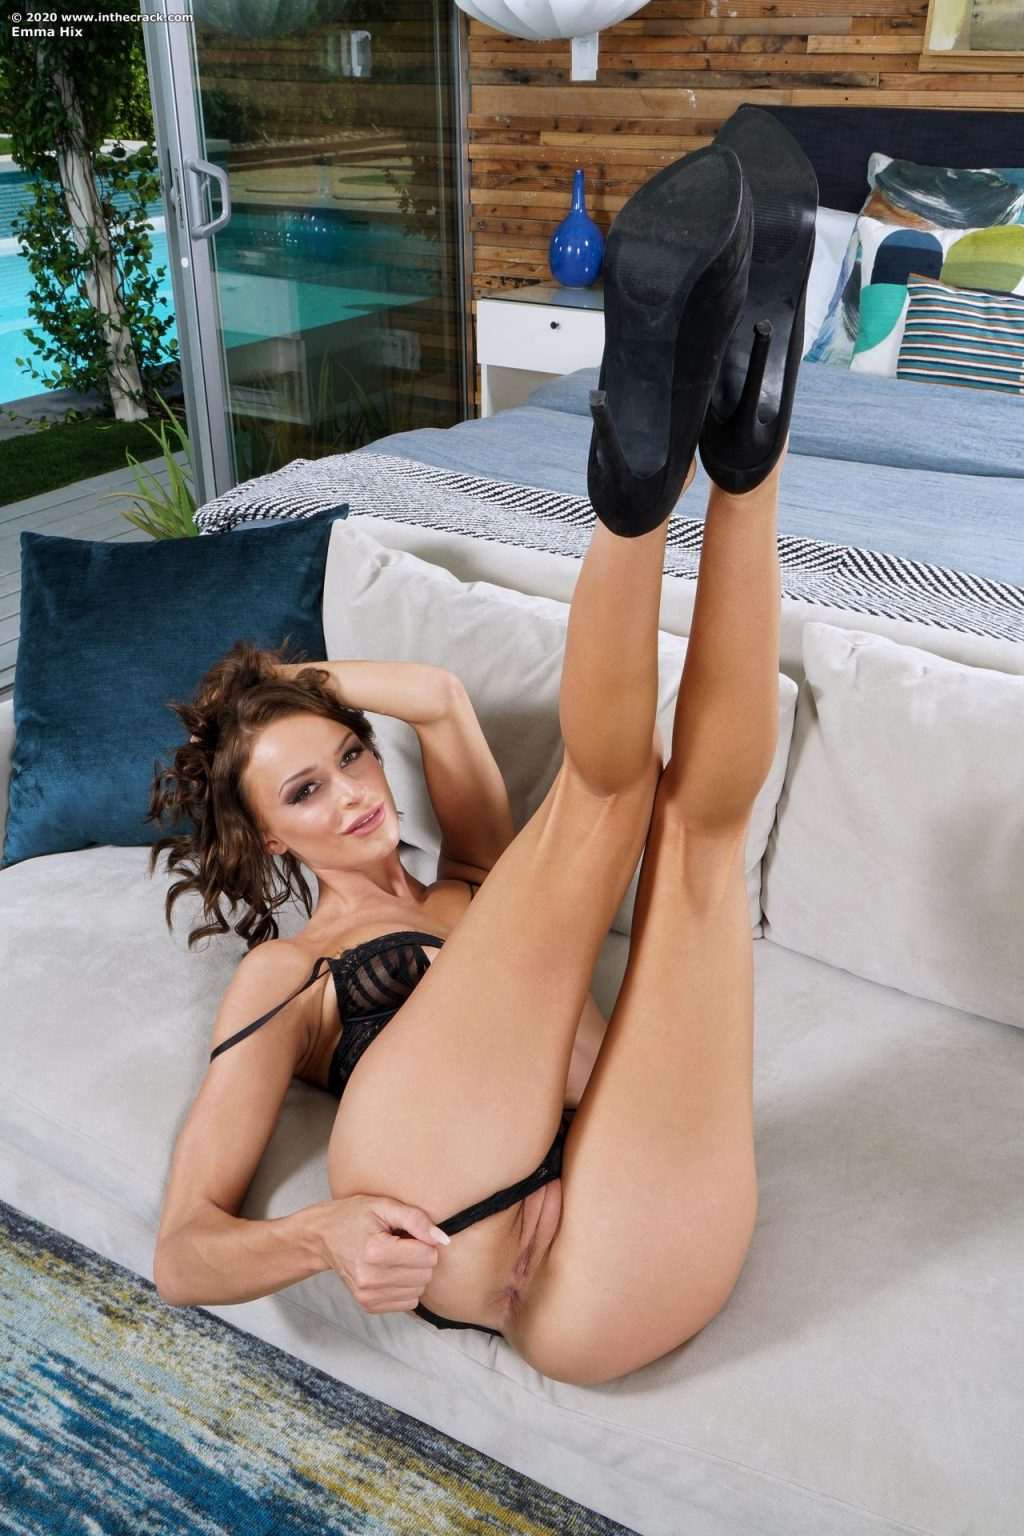 Emma Hix Nude (22 Photos)